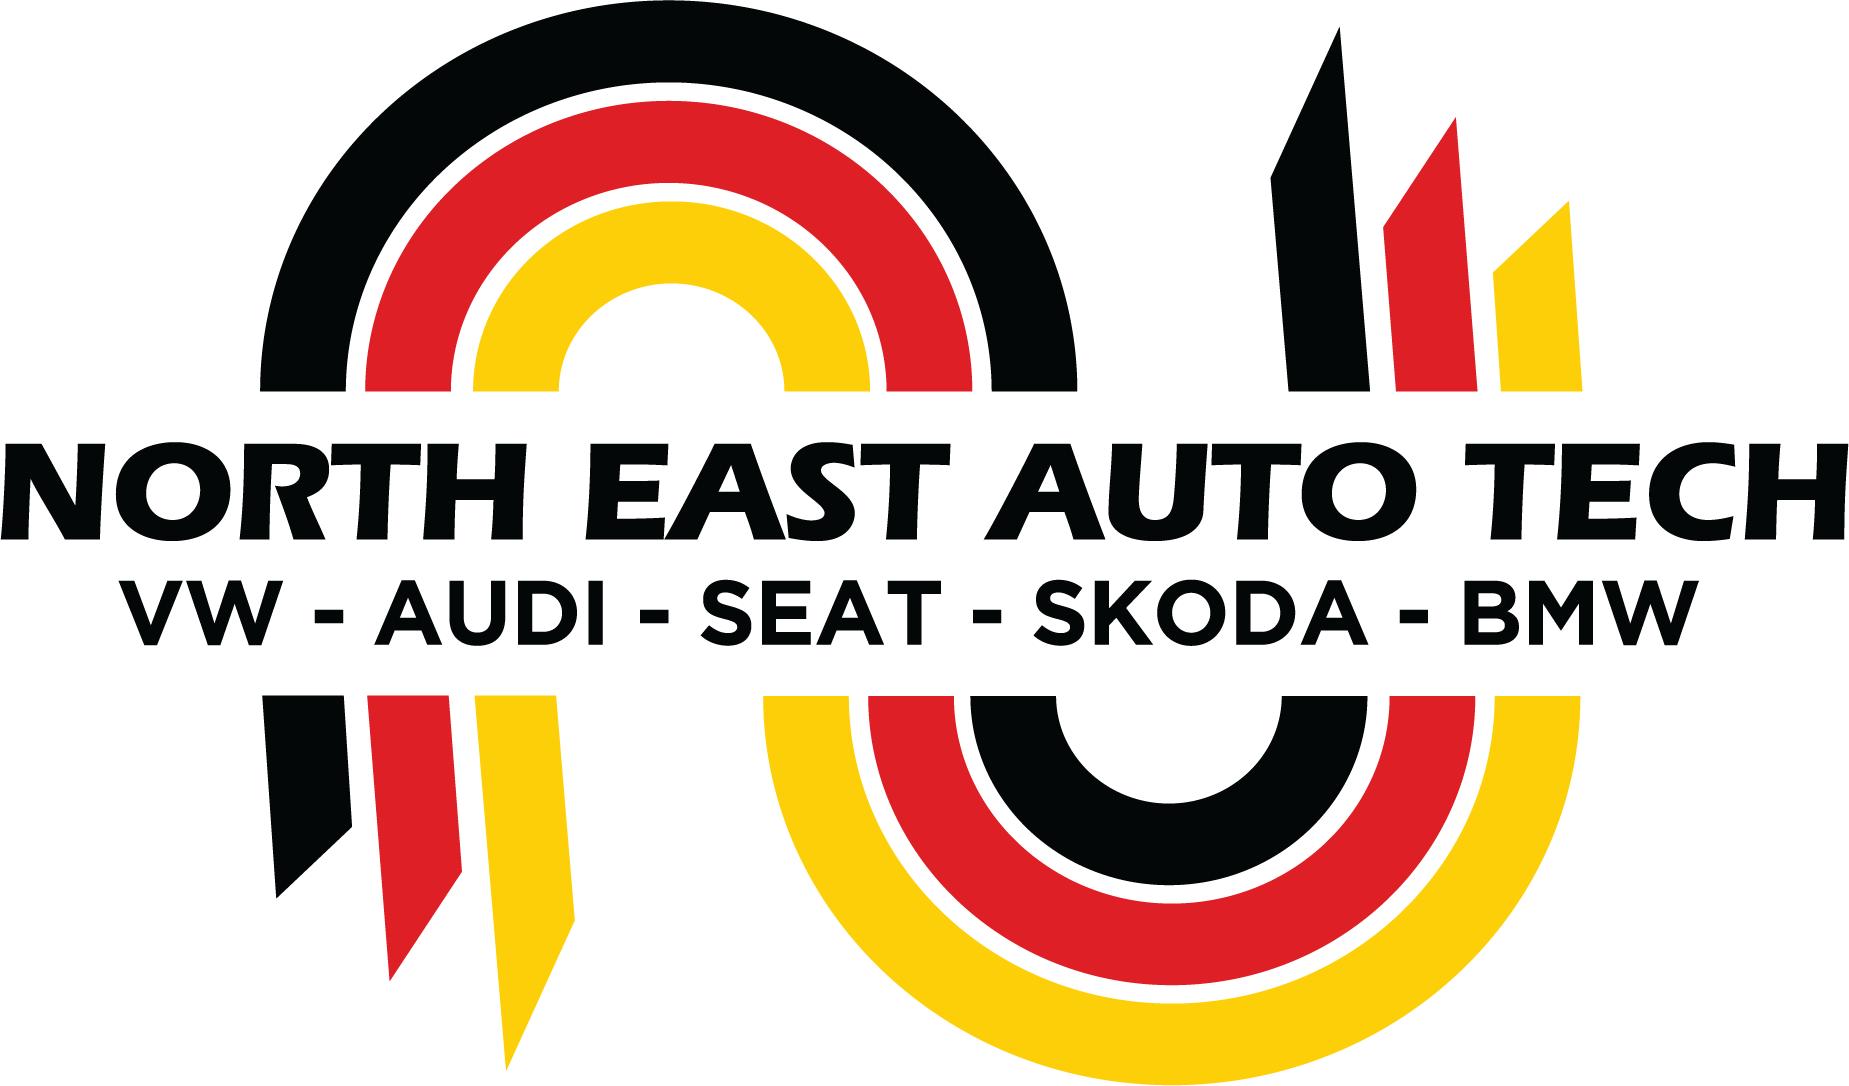 VW Audi BMW Seat Skoda